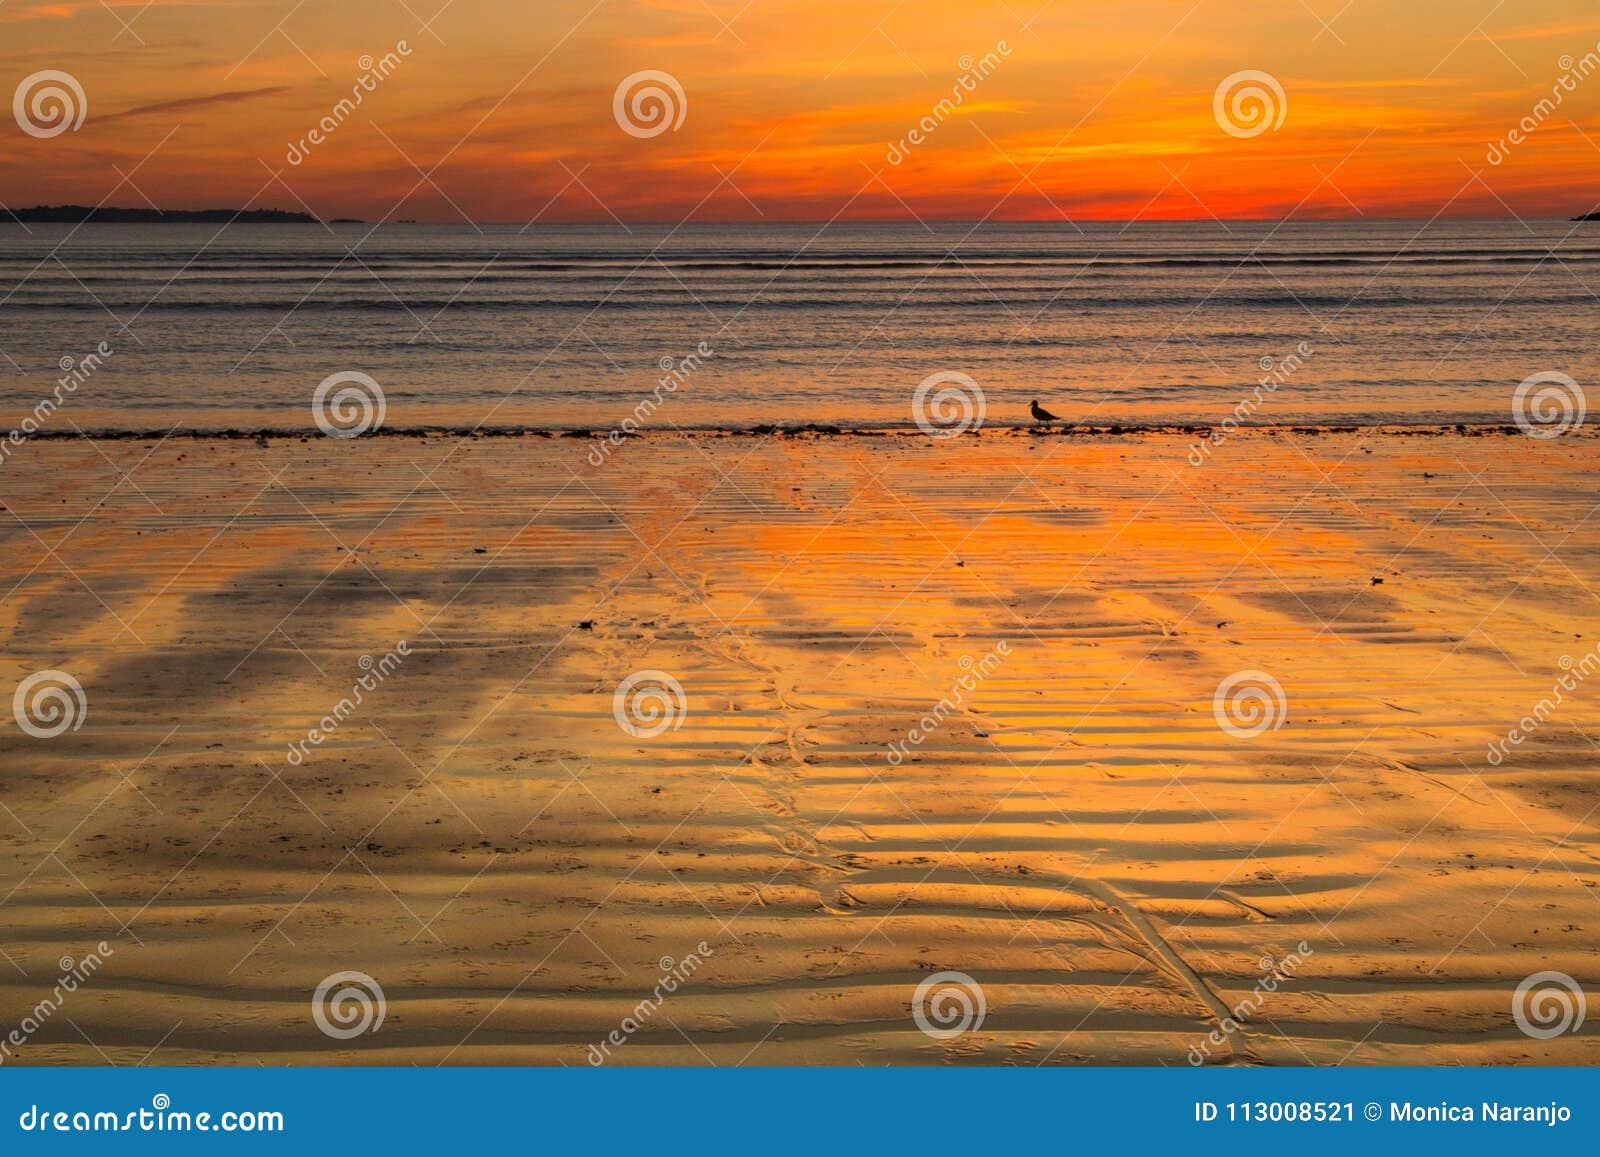 Neu-England Herbstsonnenaufgang am Strand